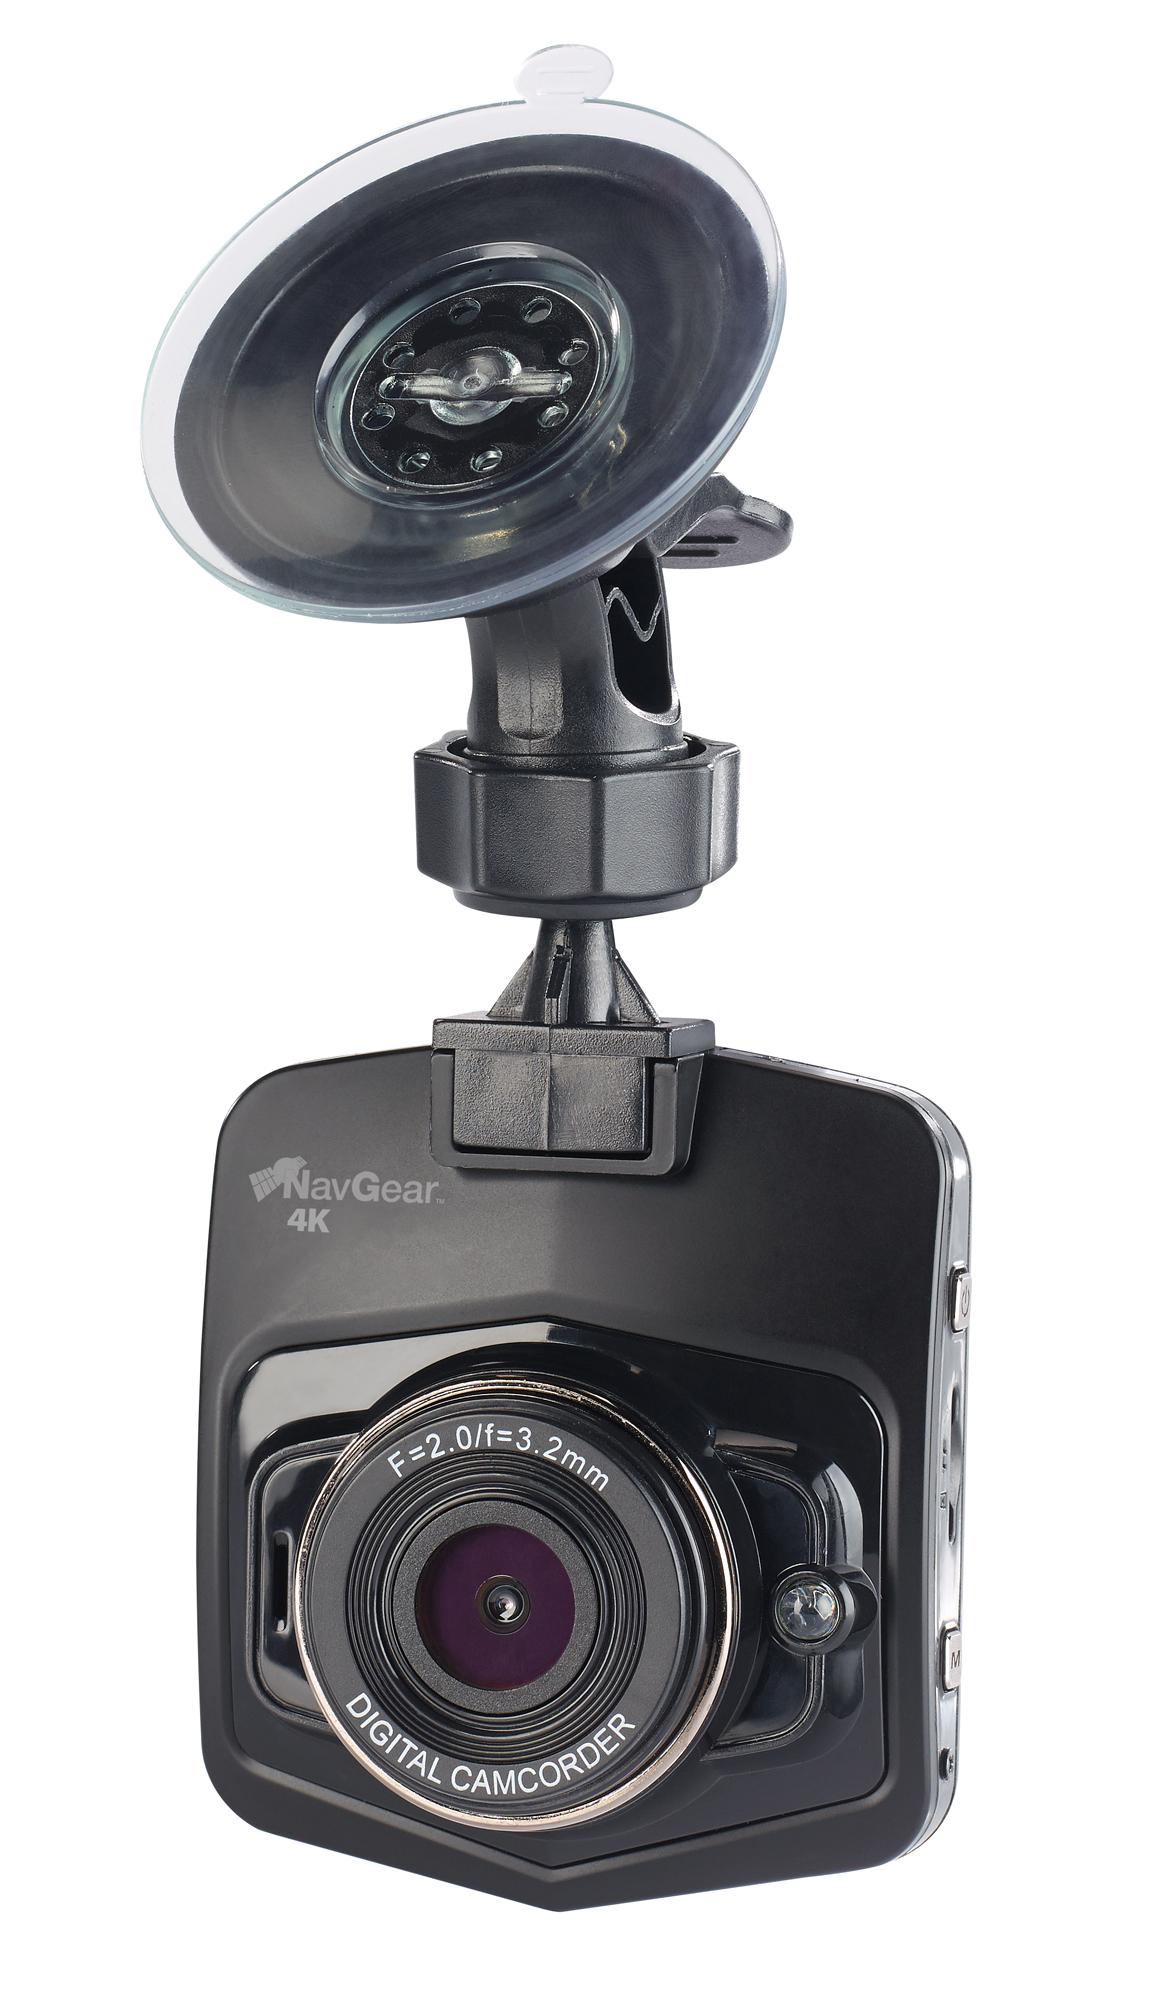 NavGear 4K-Dashcam mit G-Sensor, WLAN, UHD, 170 Grad